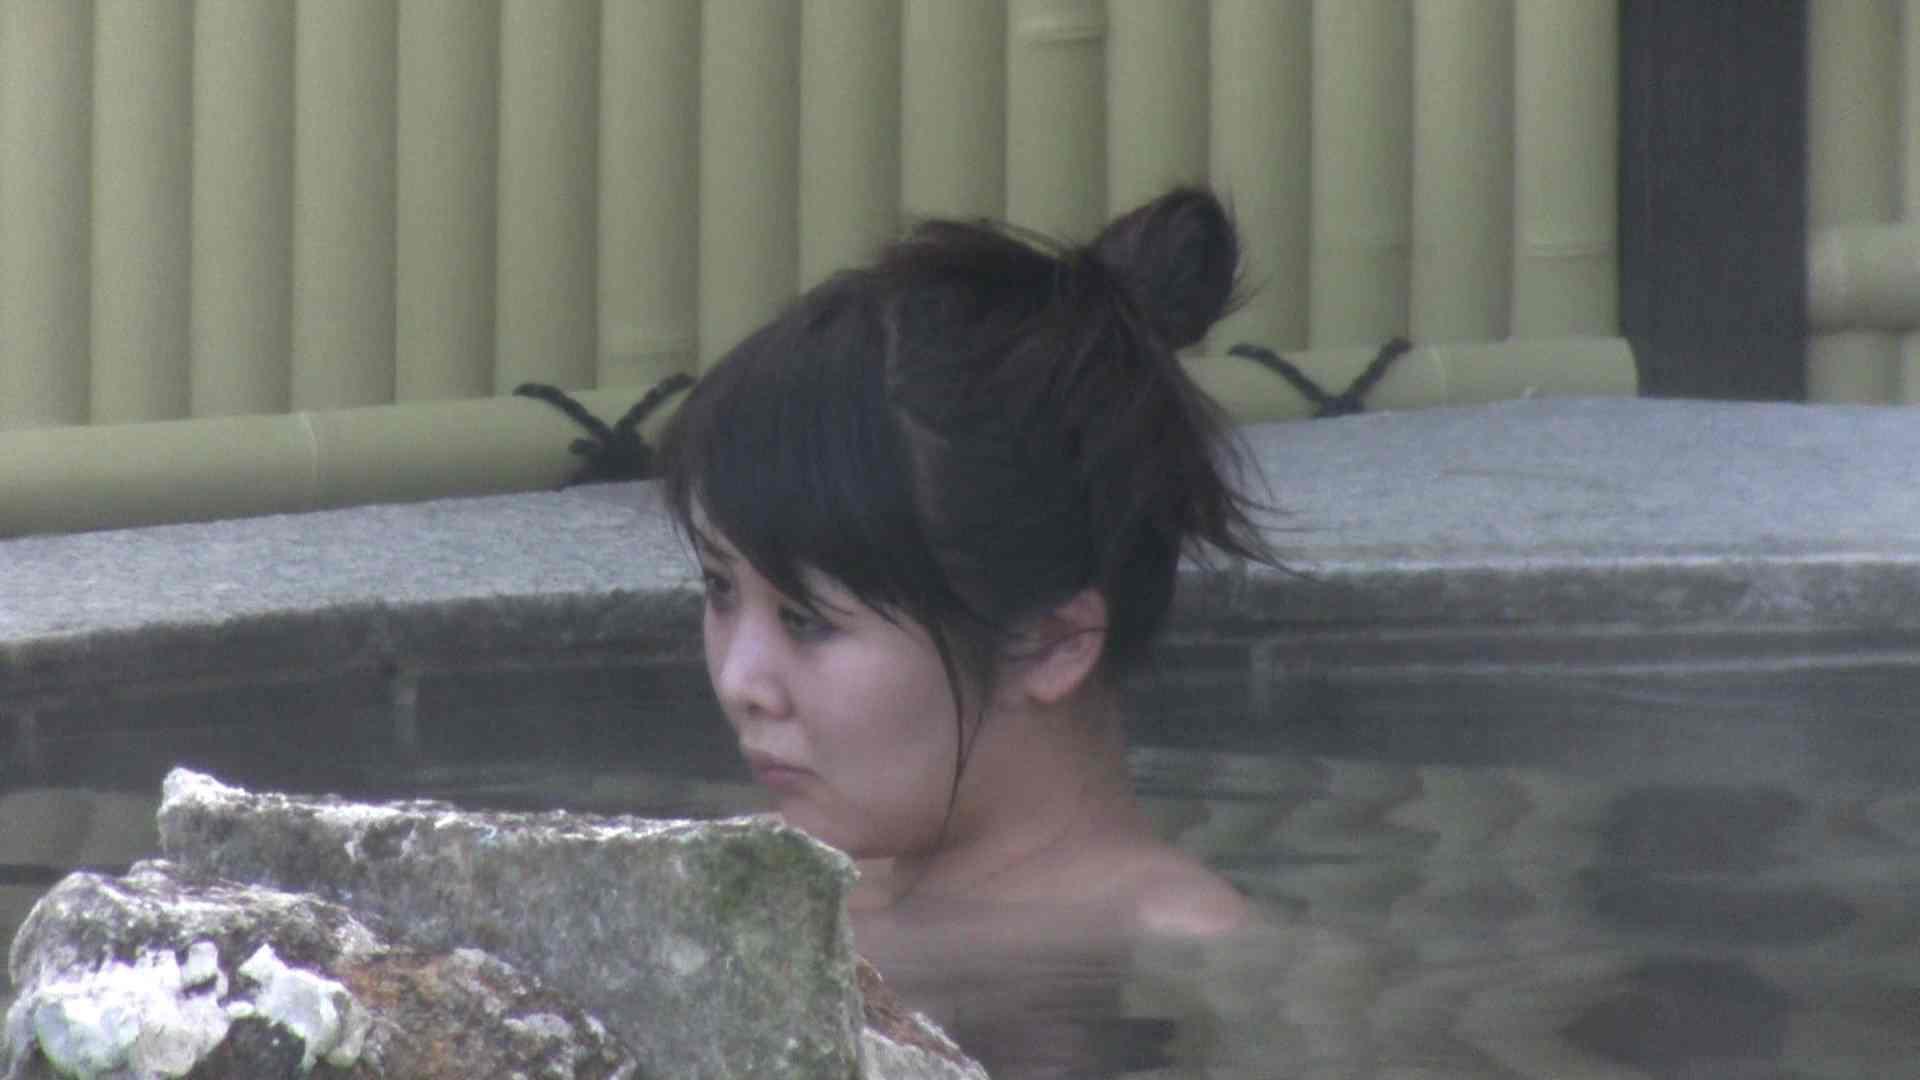 Aquaな露天風呂Vol.118 盗撮大放出 濡れ場動画紹介 85連発 39